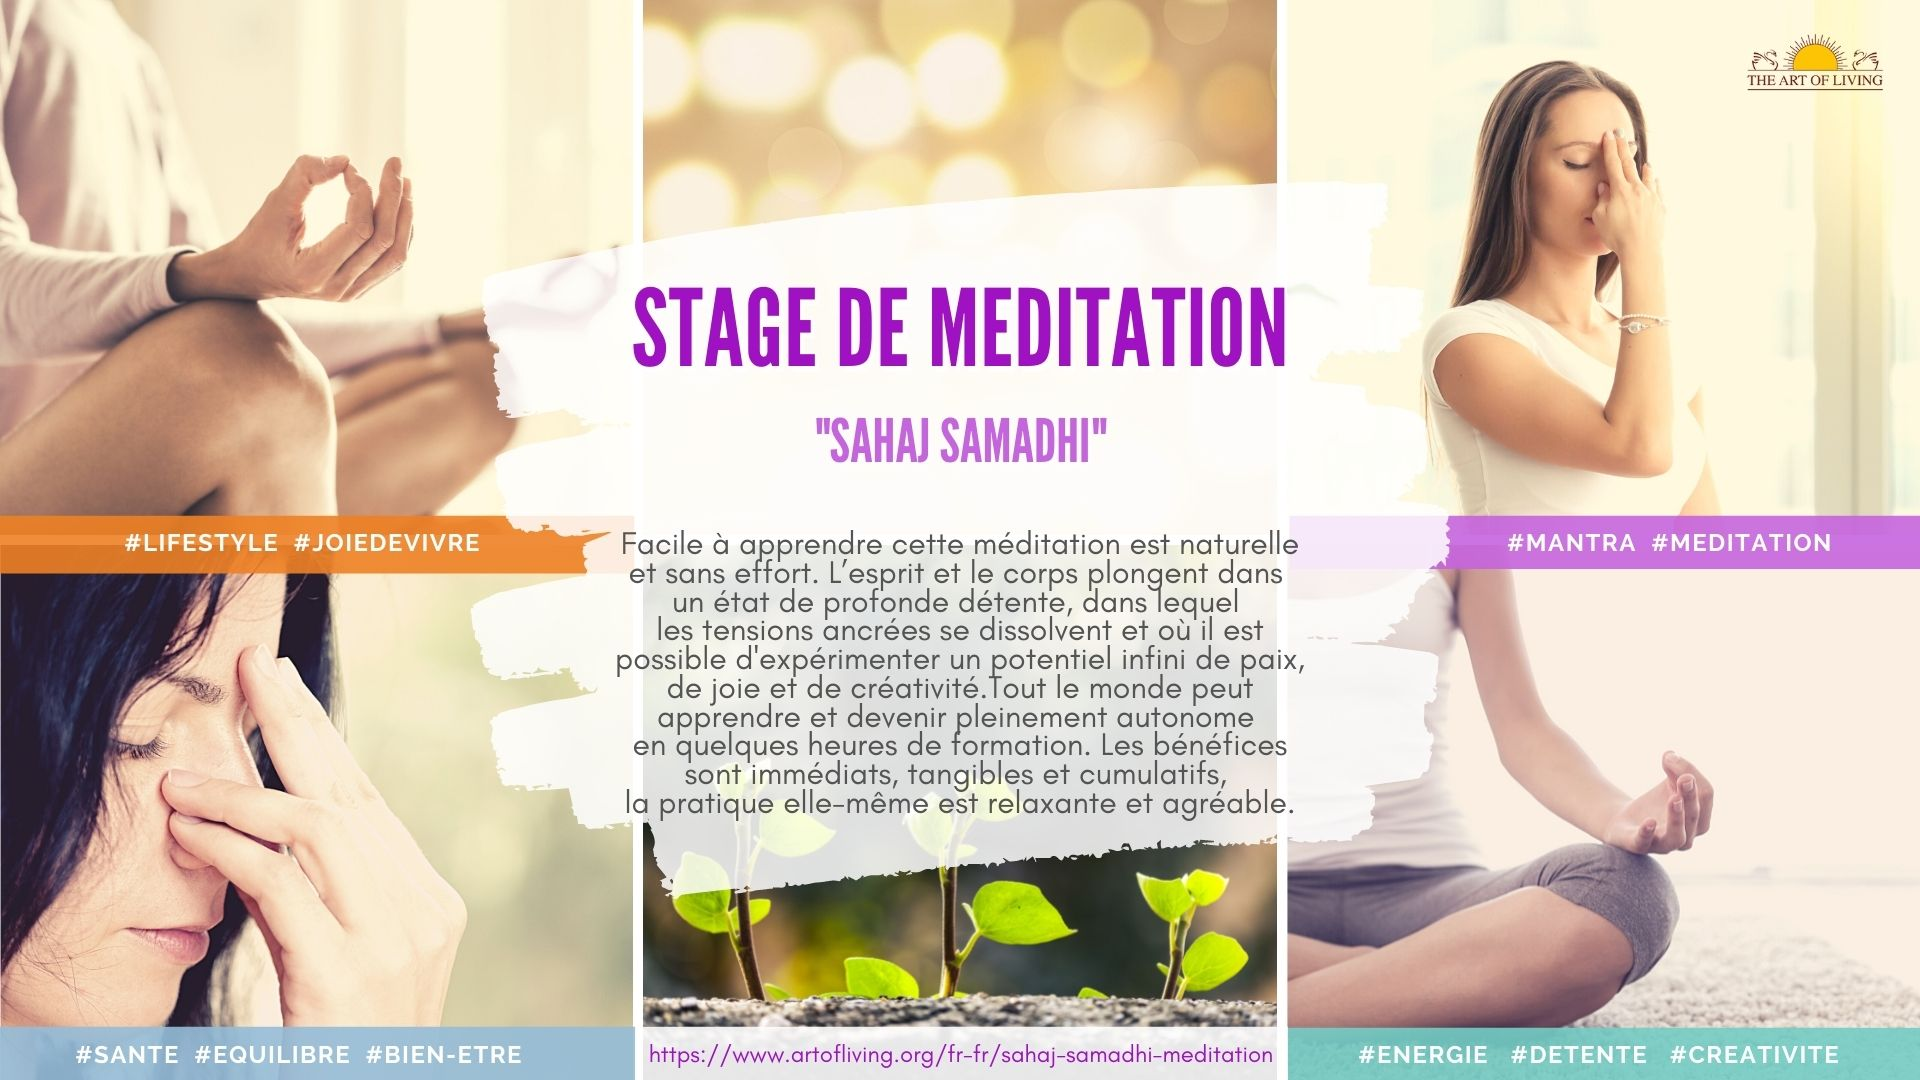 Stage de Méditation Sahaj Samadhi